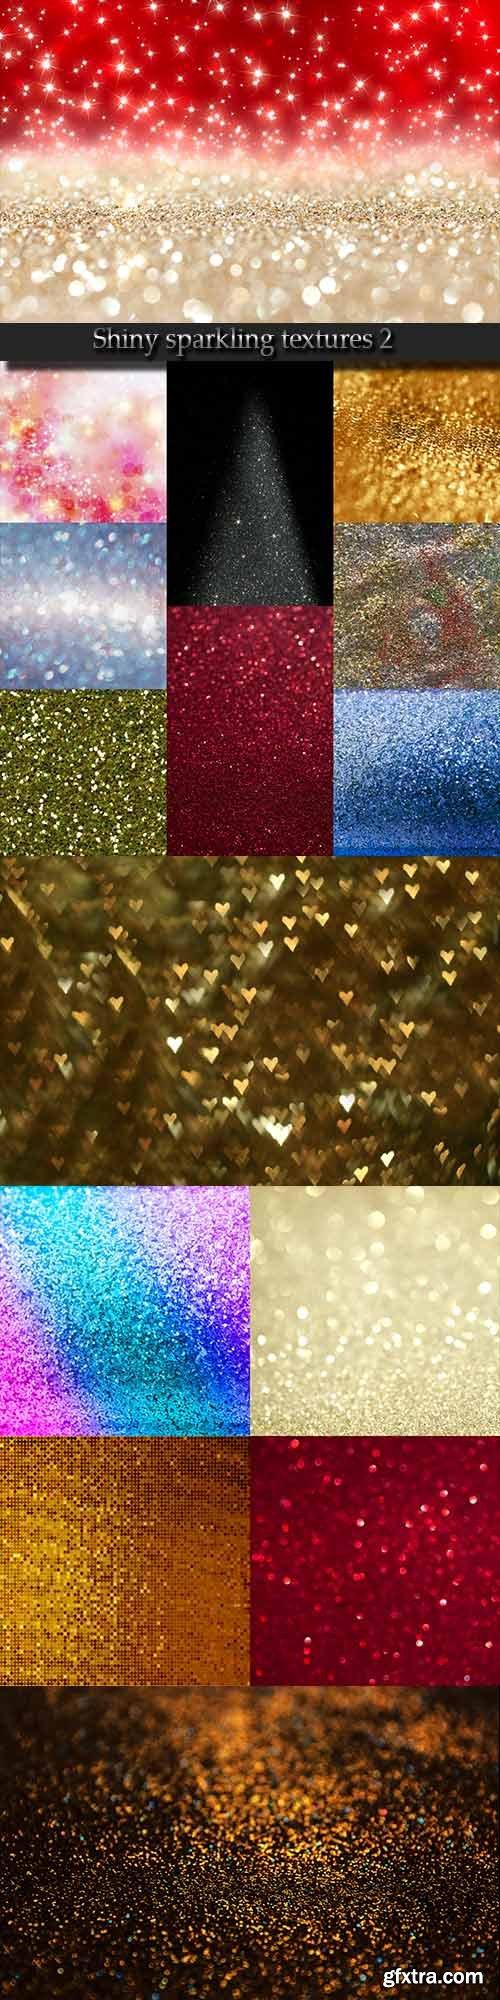 Shiny sparkling textures 2